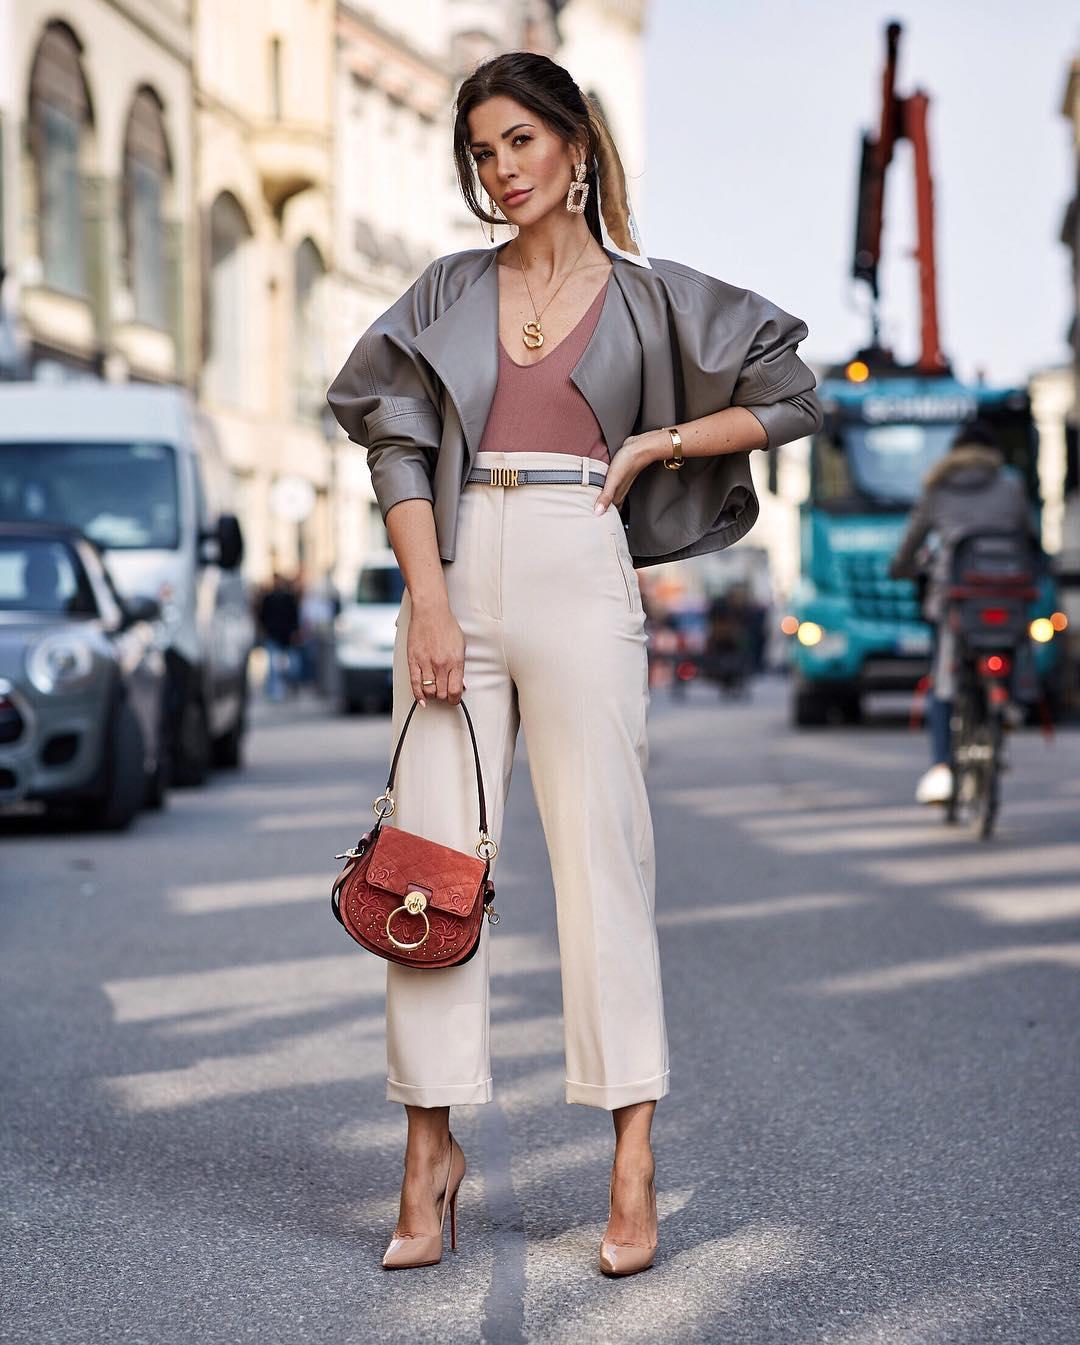 брюки женские 2019 фото 14